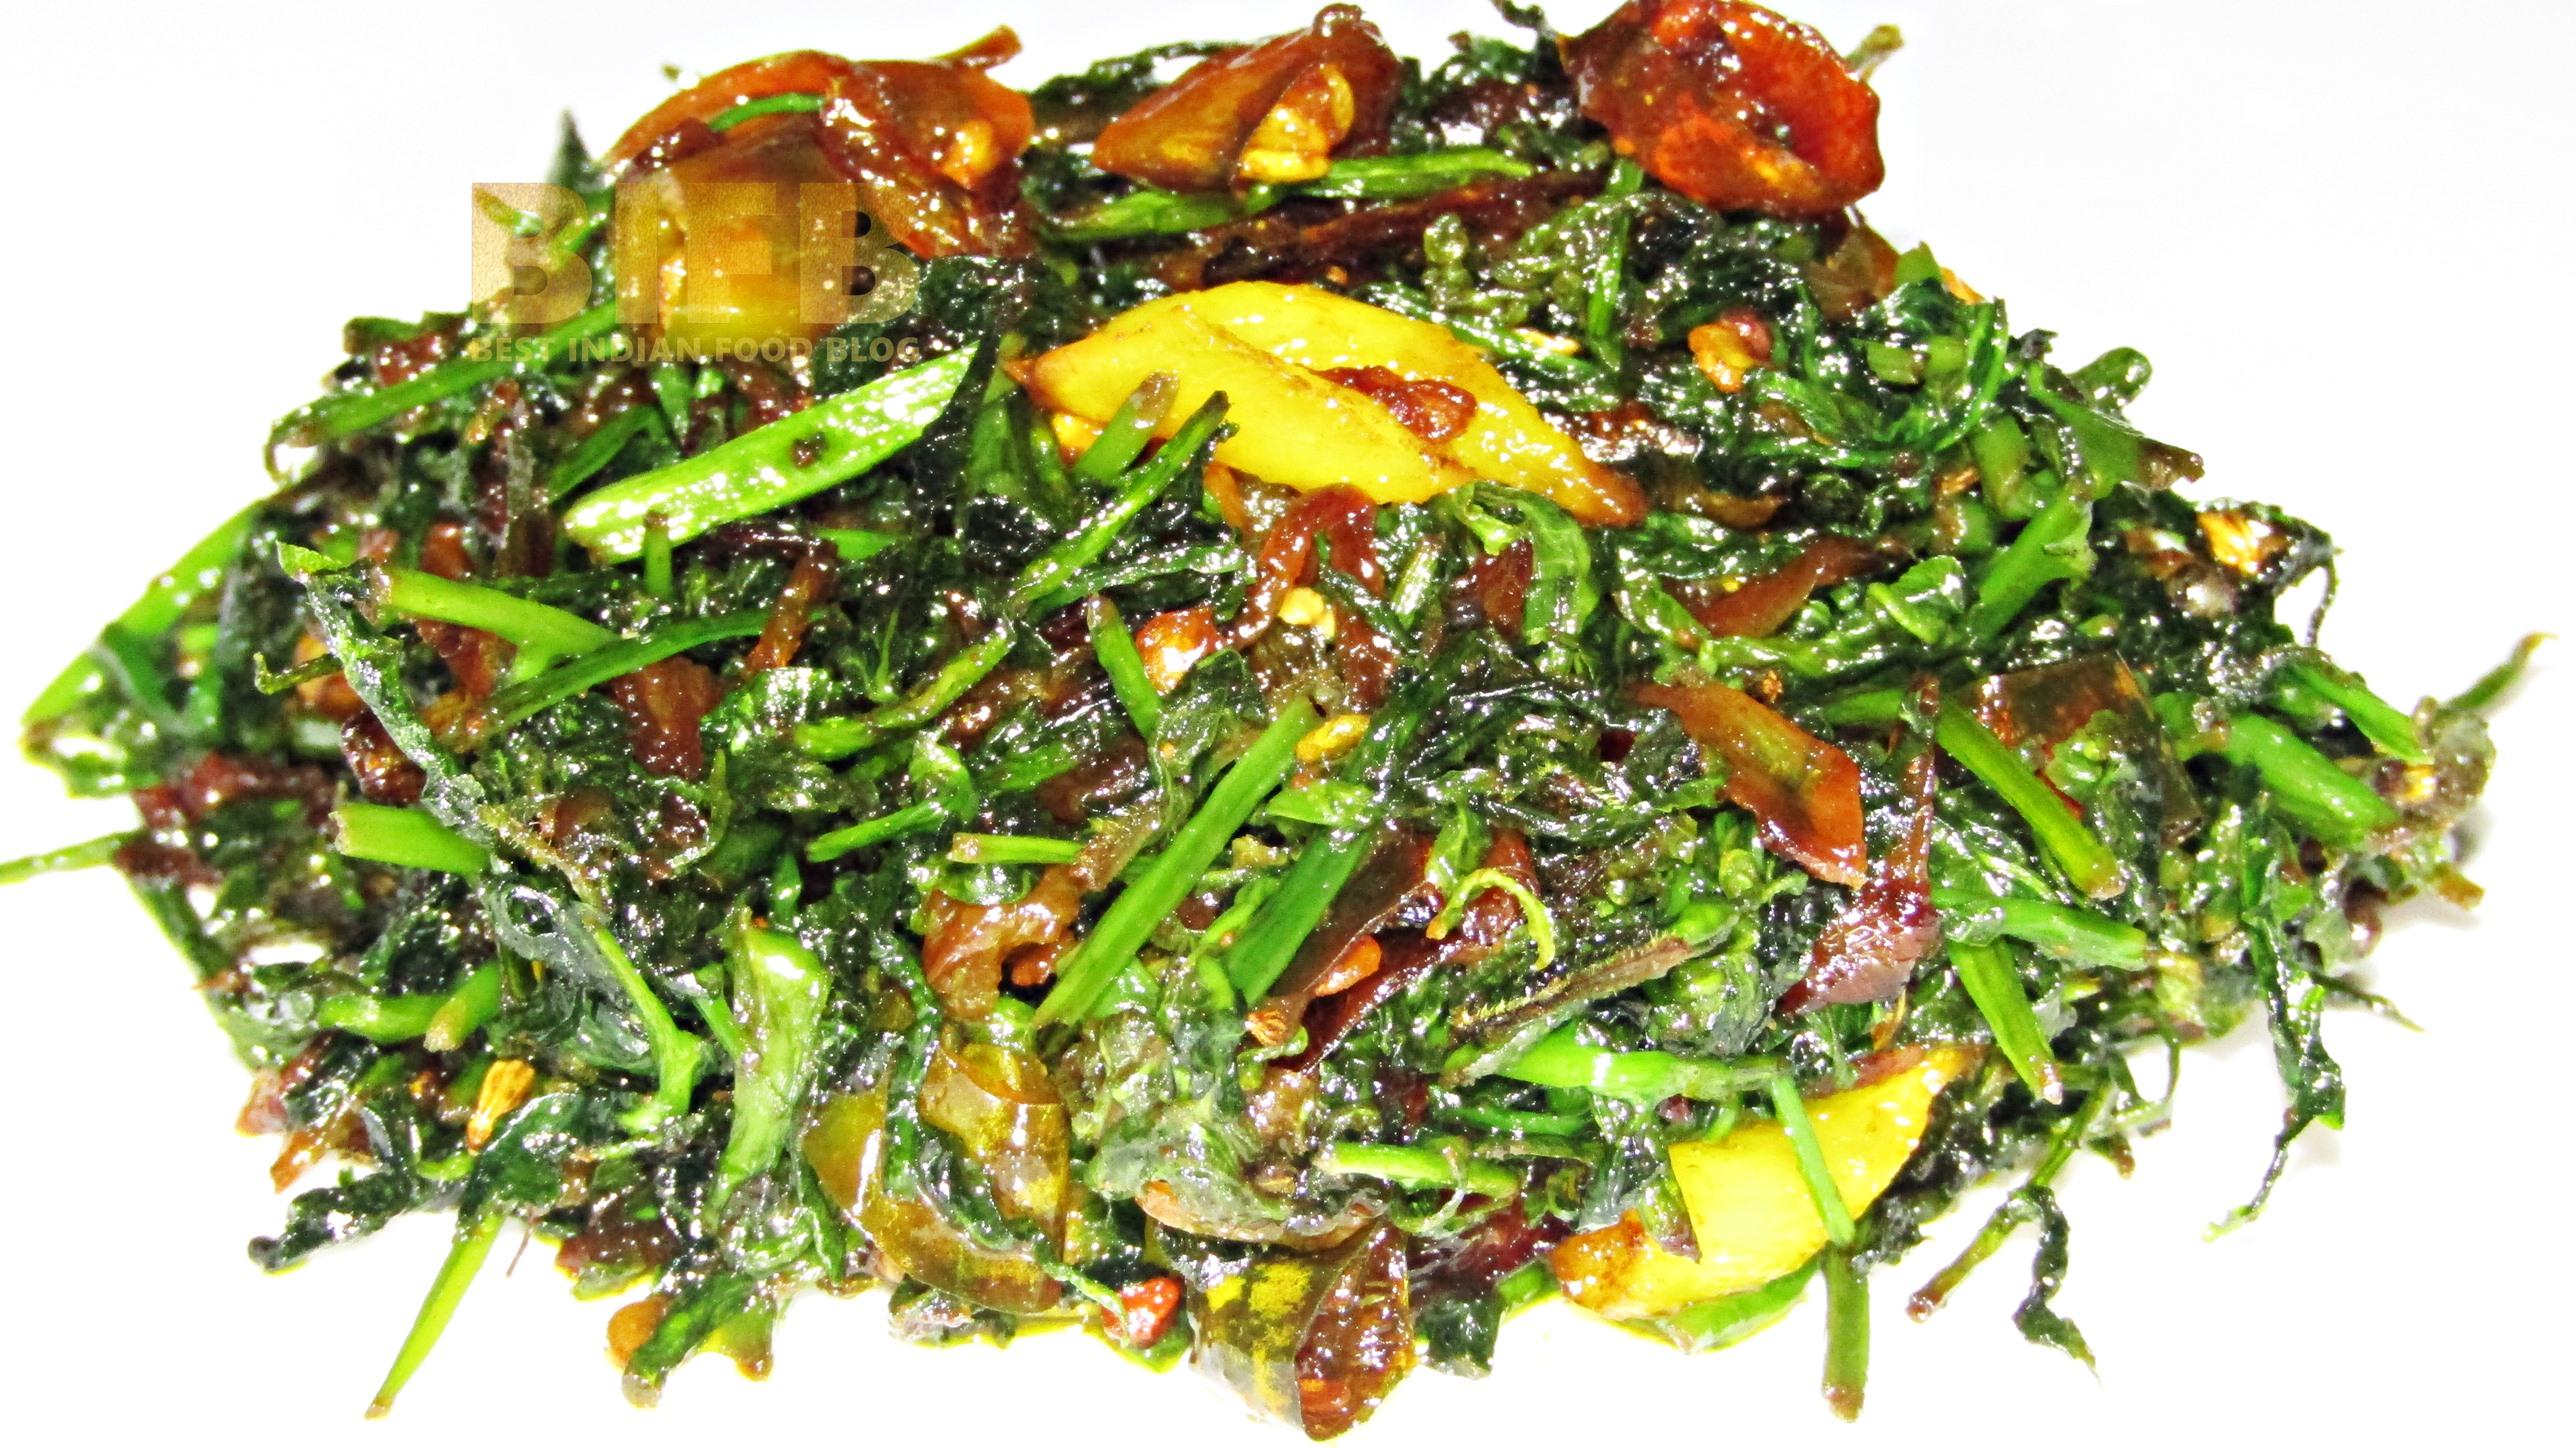 Dhekia Haak Bhaji from Assam, India   Best Indian Food Blog   Fiddlehead Greens recipe